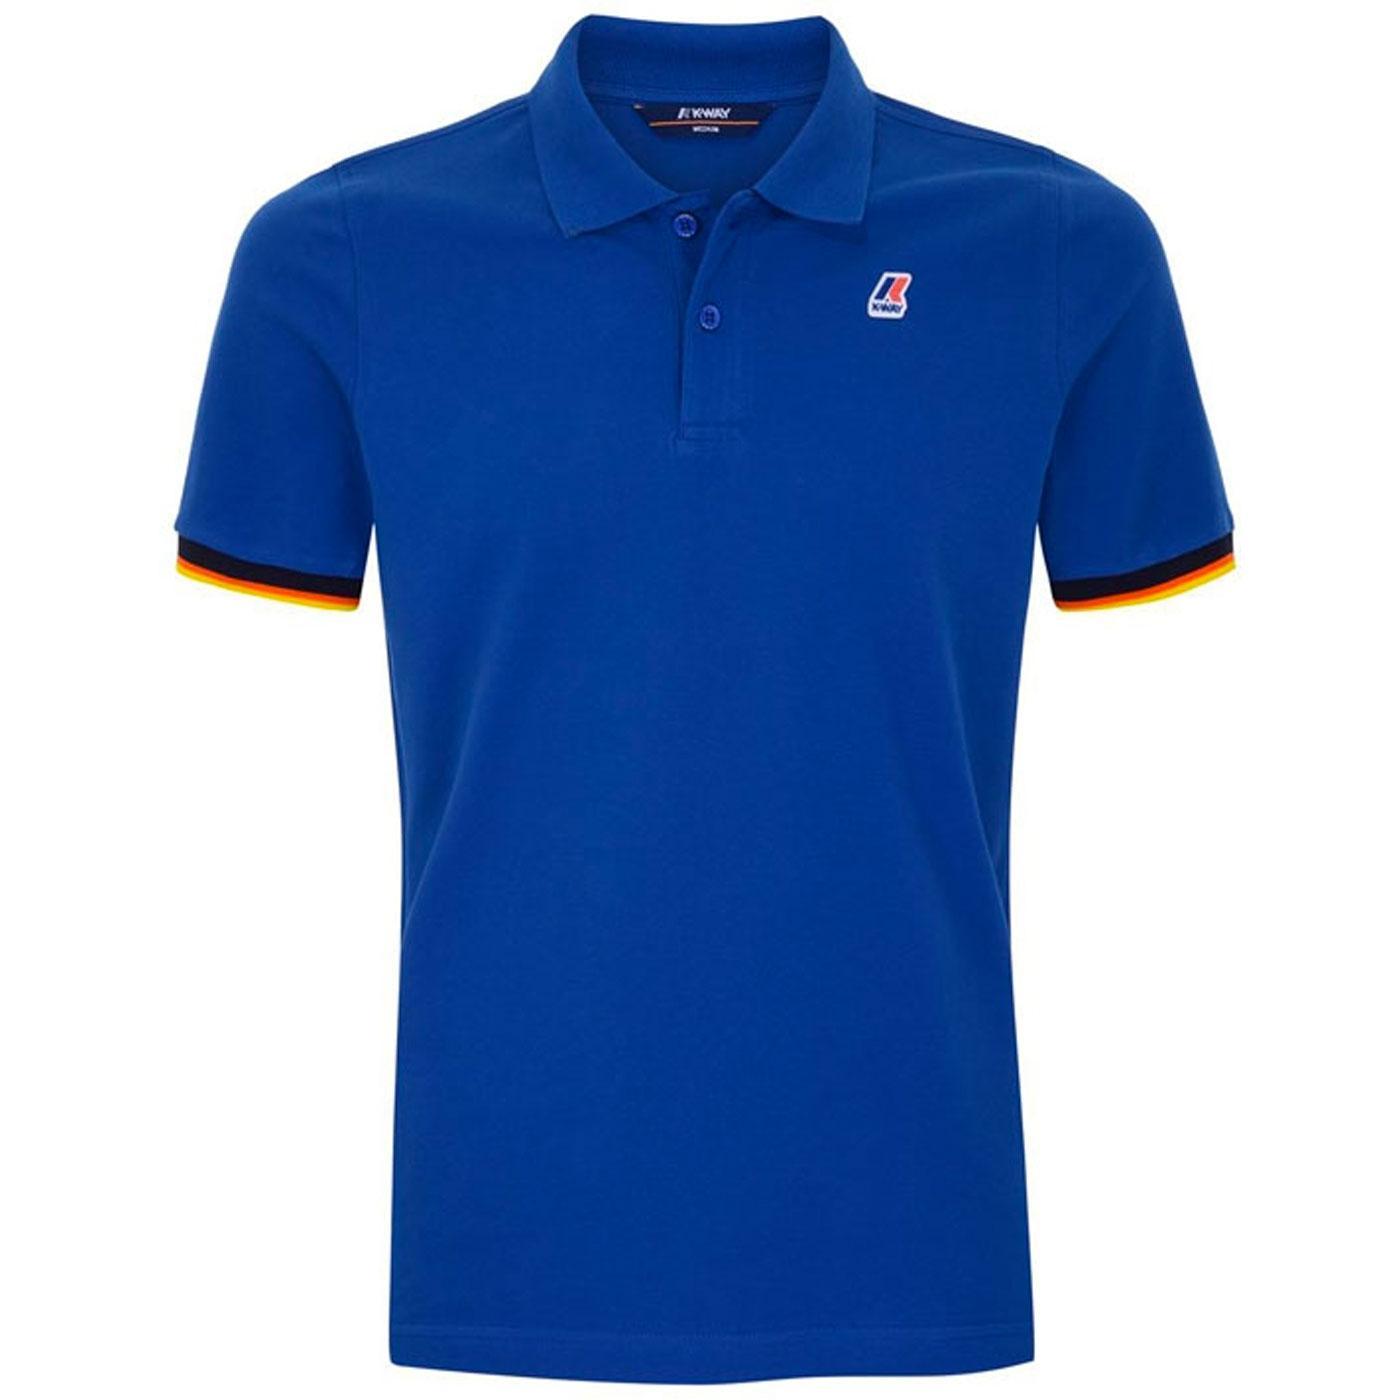 Vincent K-WAY Retro Mod Pique Polo Shirt (Royal)